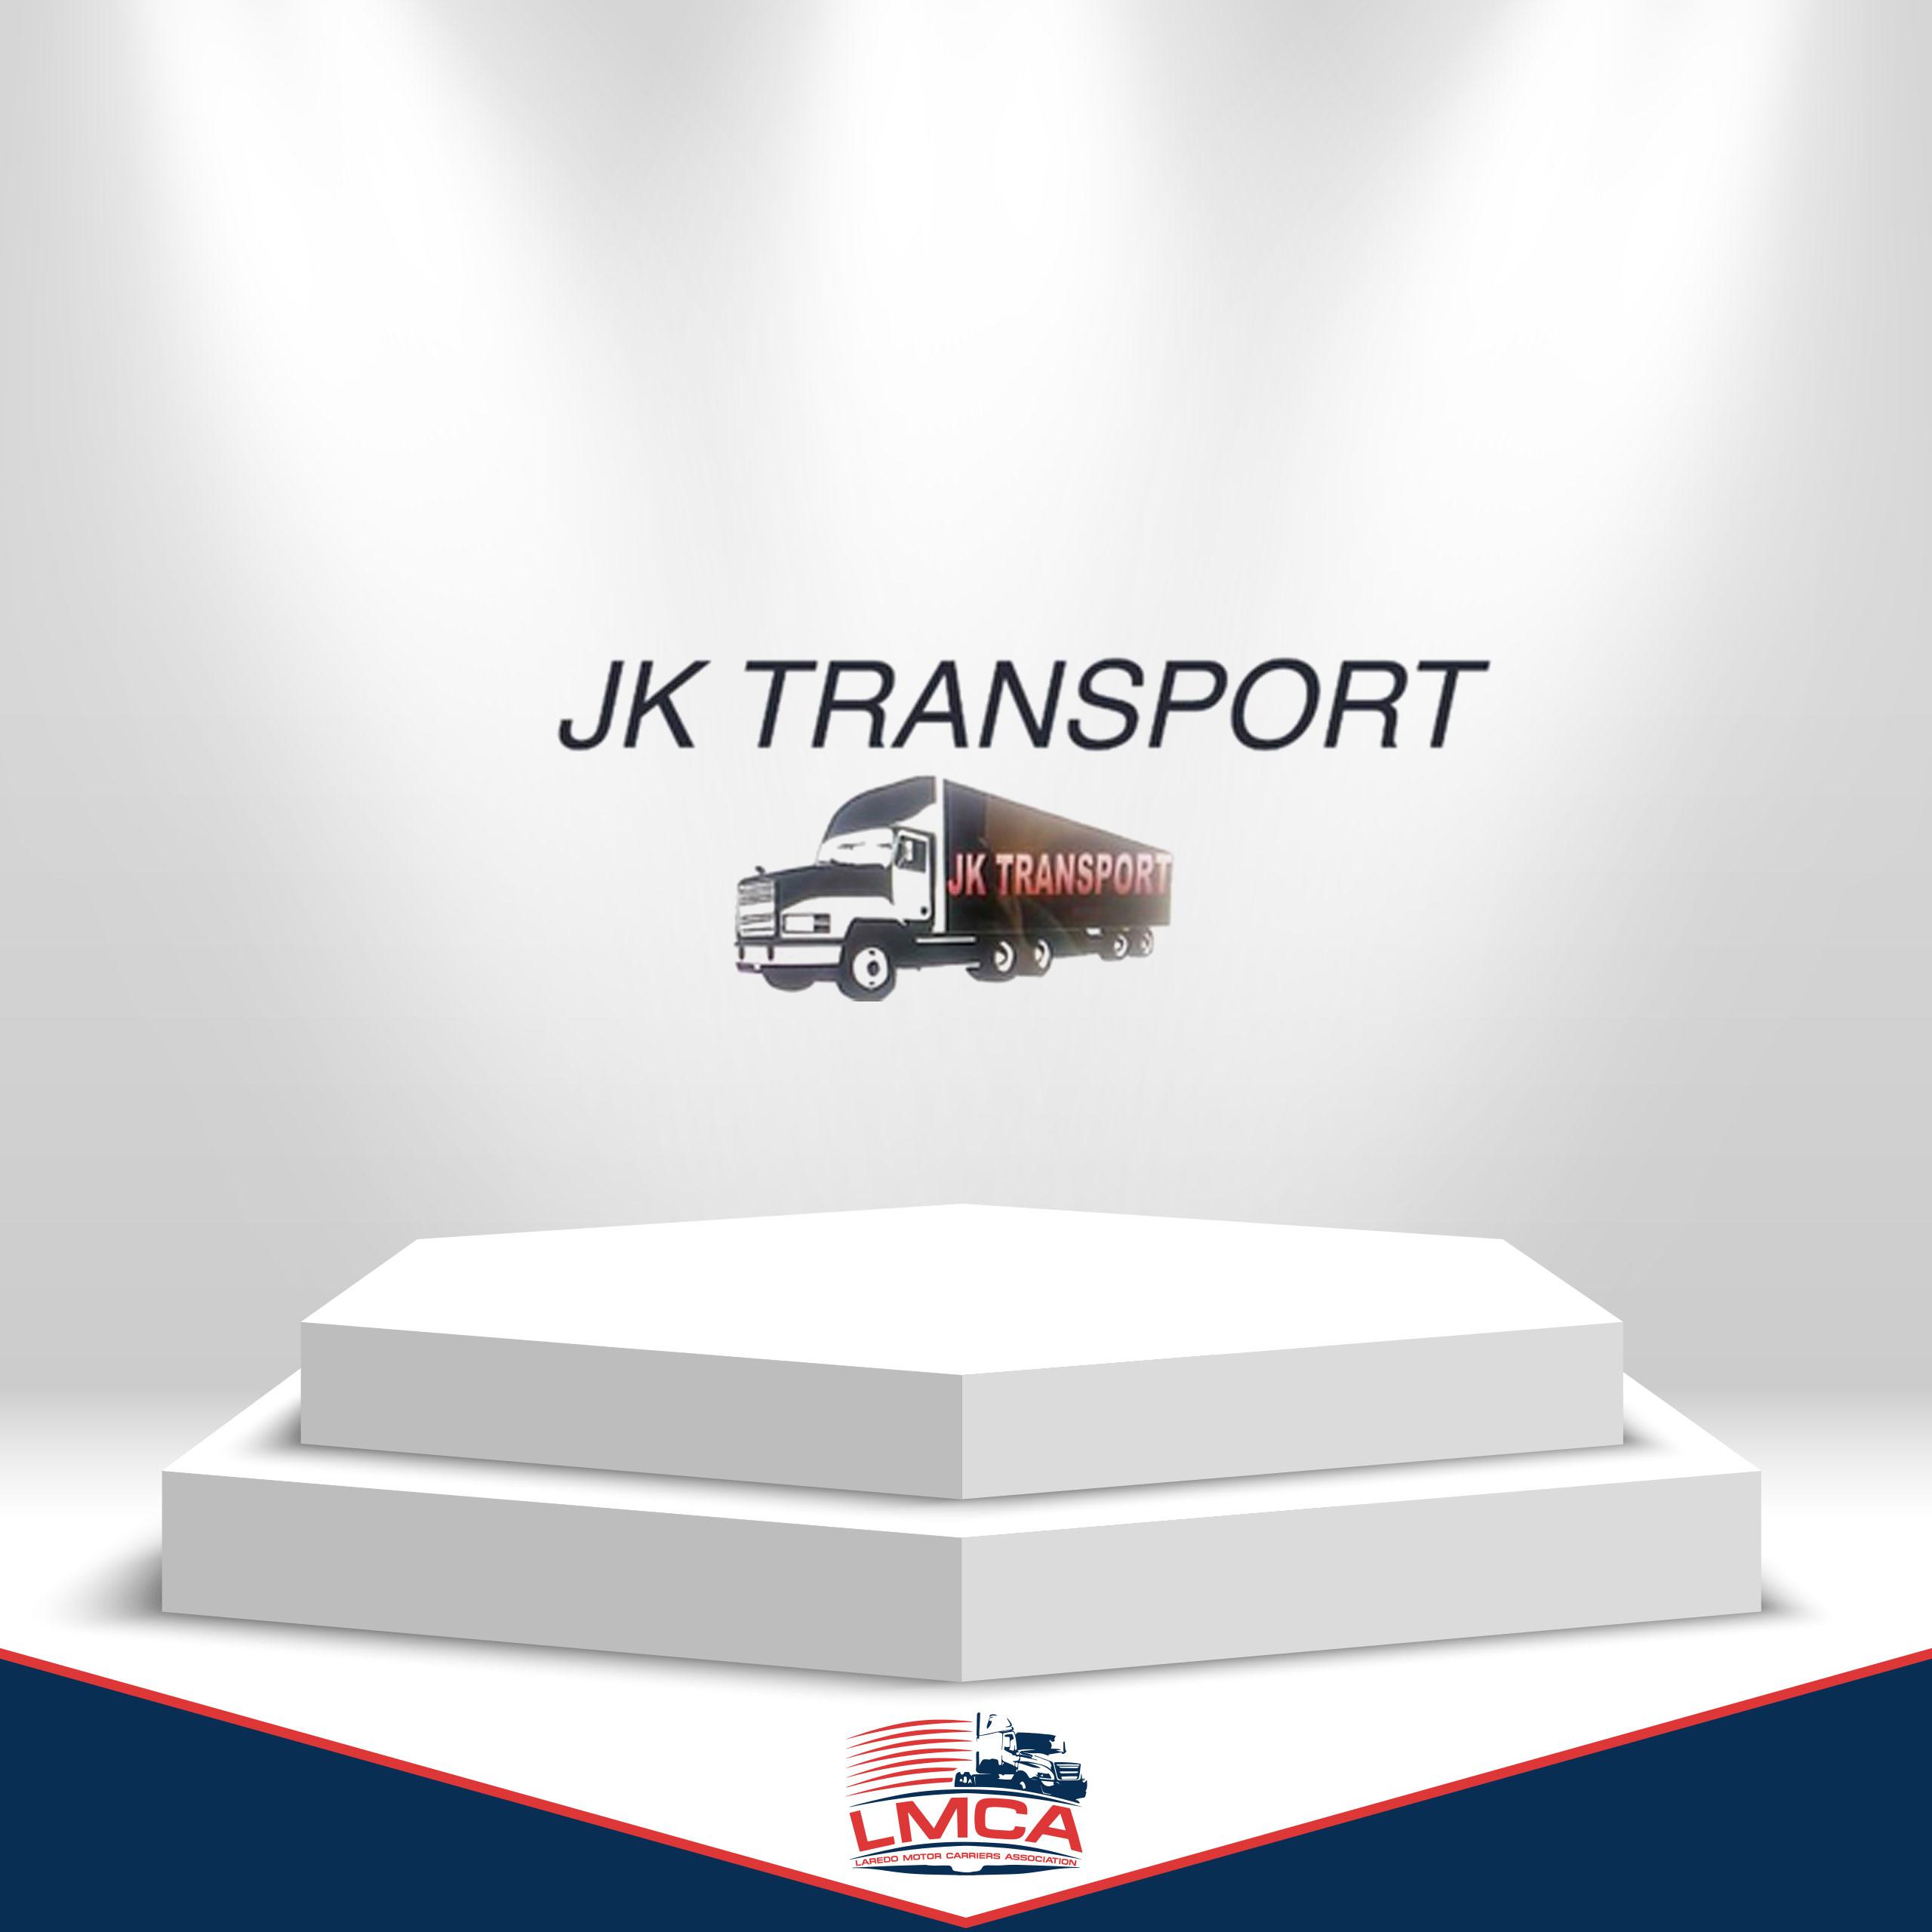 jktransportlmca